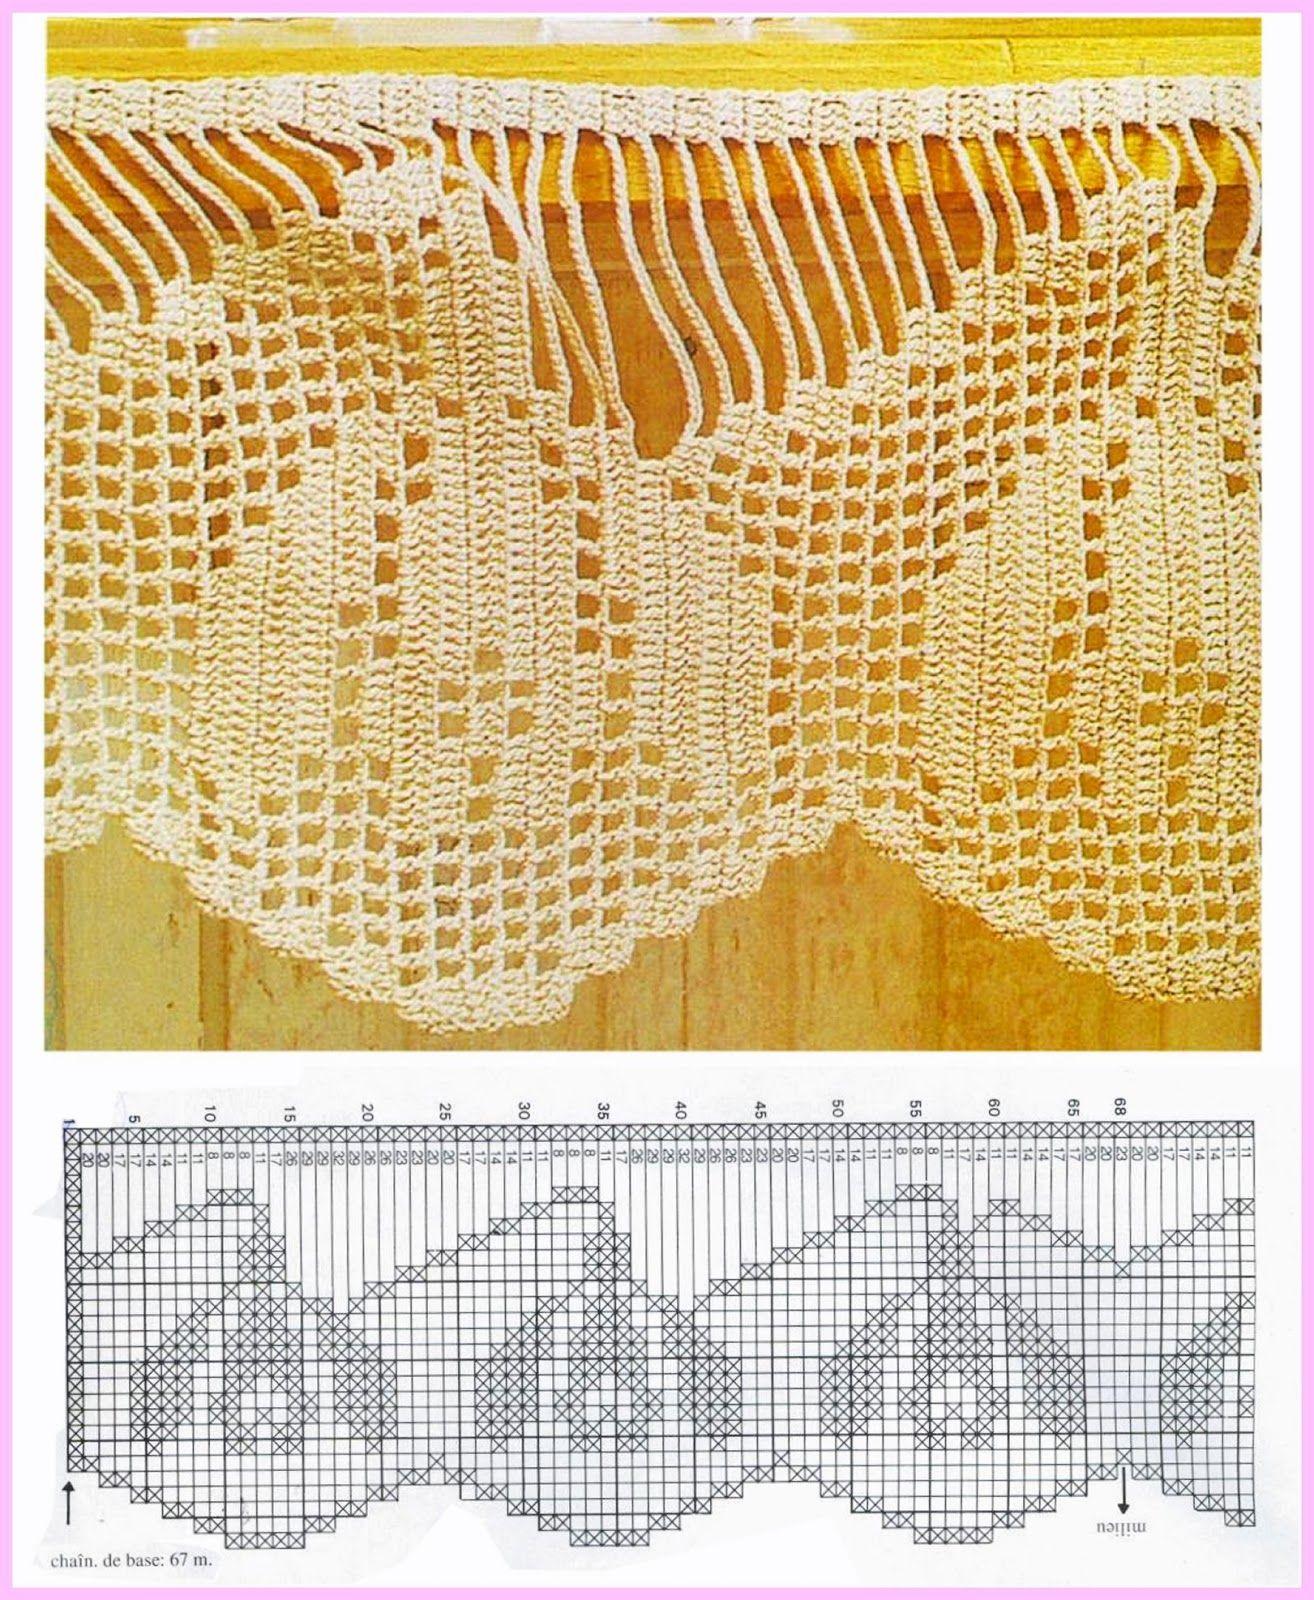 barrado+6.jpg 1,314×1,600 piksel